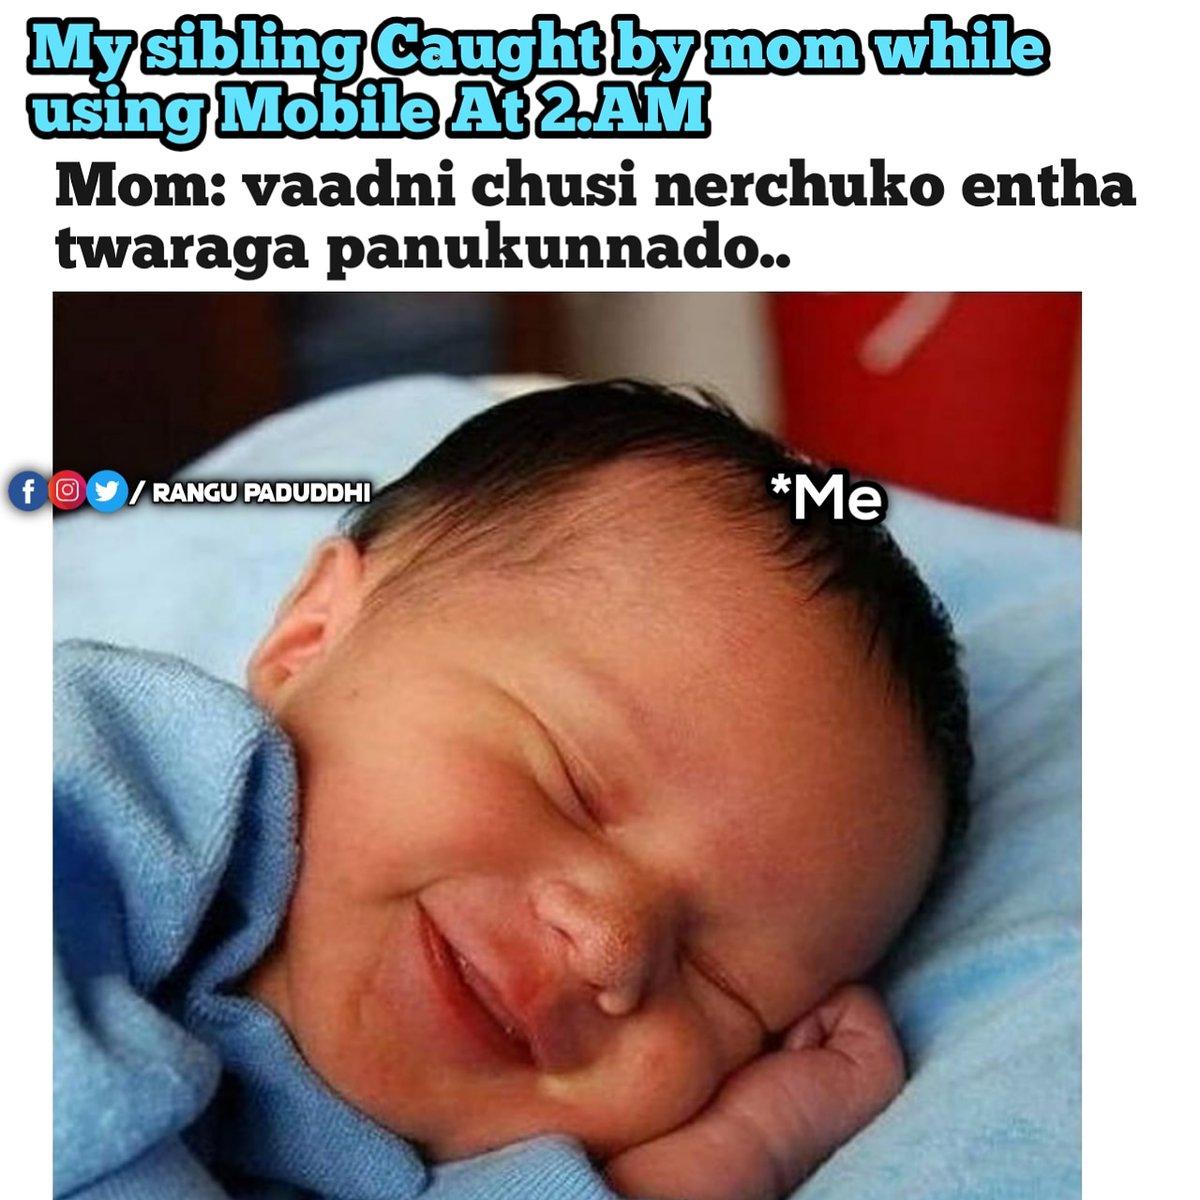 Alert undali kadha nanna... For more fun Do follow - @rangu_paduddhi #rangupaduddhi #comedy #fun #memes #memesdaily #telugumemes #trolls #telugumeme #telugucomedy  #babunuvvubtechah #btechlife #btechjokes #btechlife #telugumeme #laugh #tollywood #telugucomedy #meme #memespic.twitter.com/LL0PSnLWnL